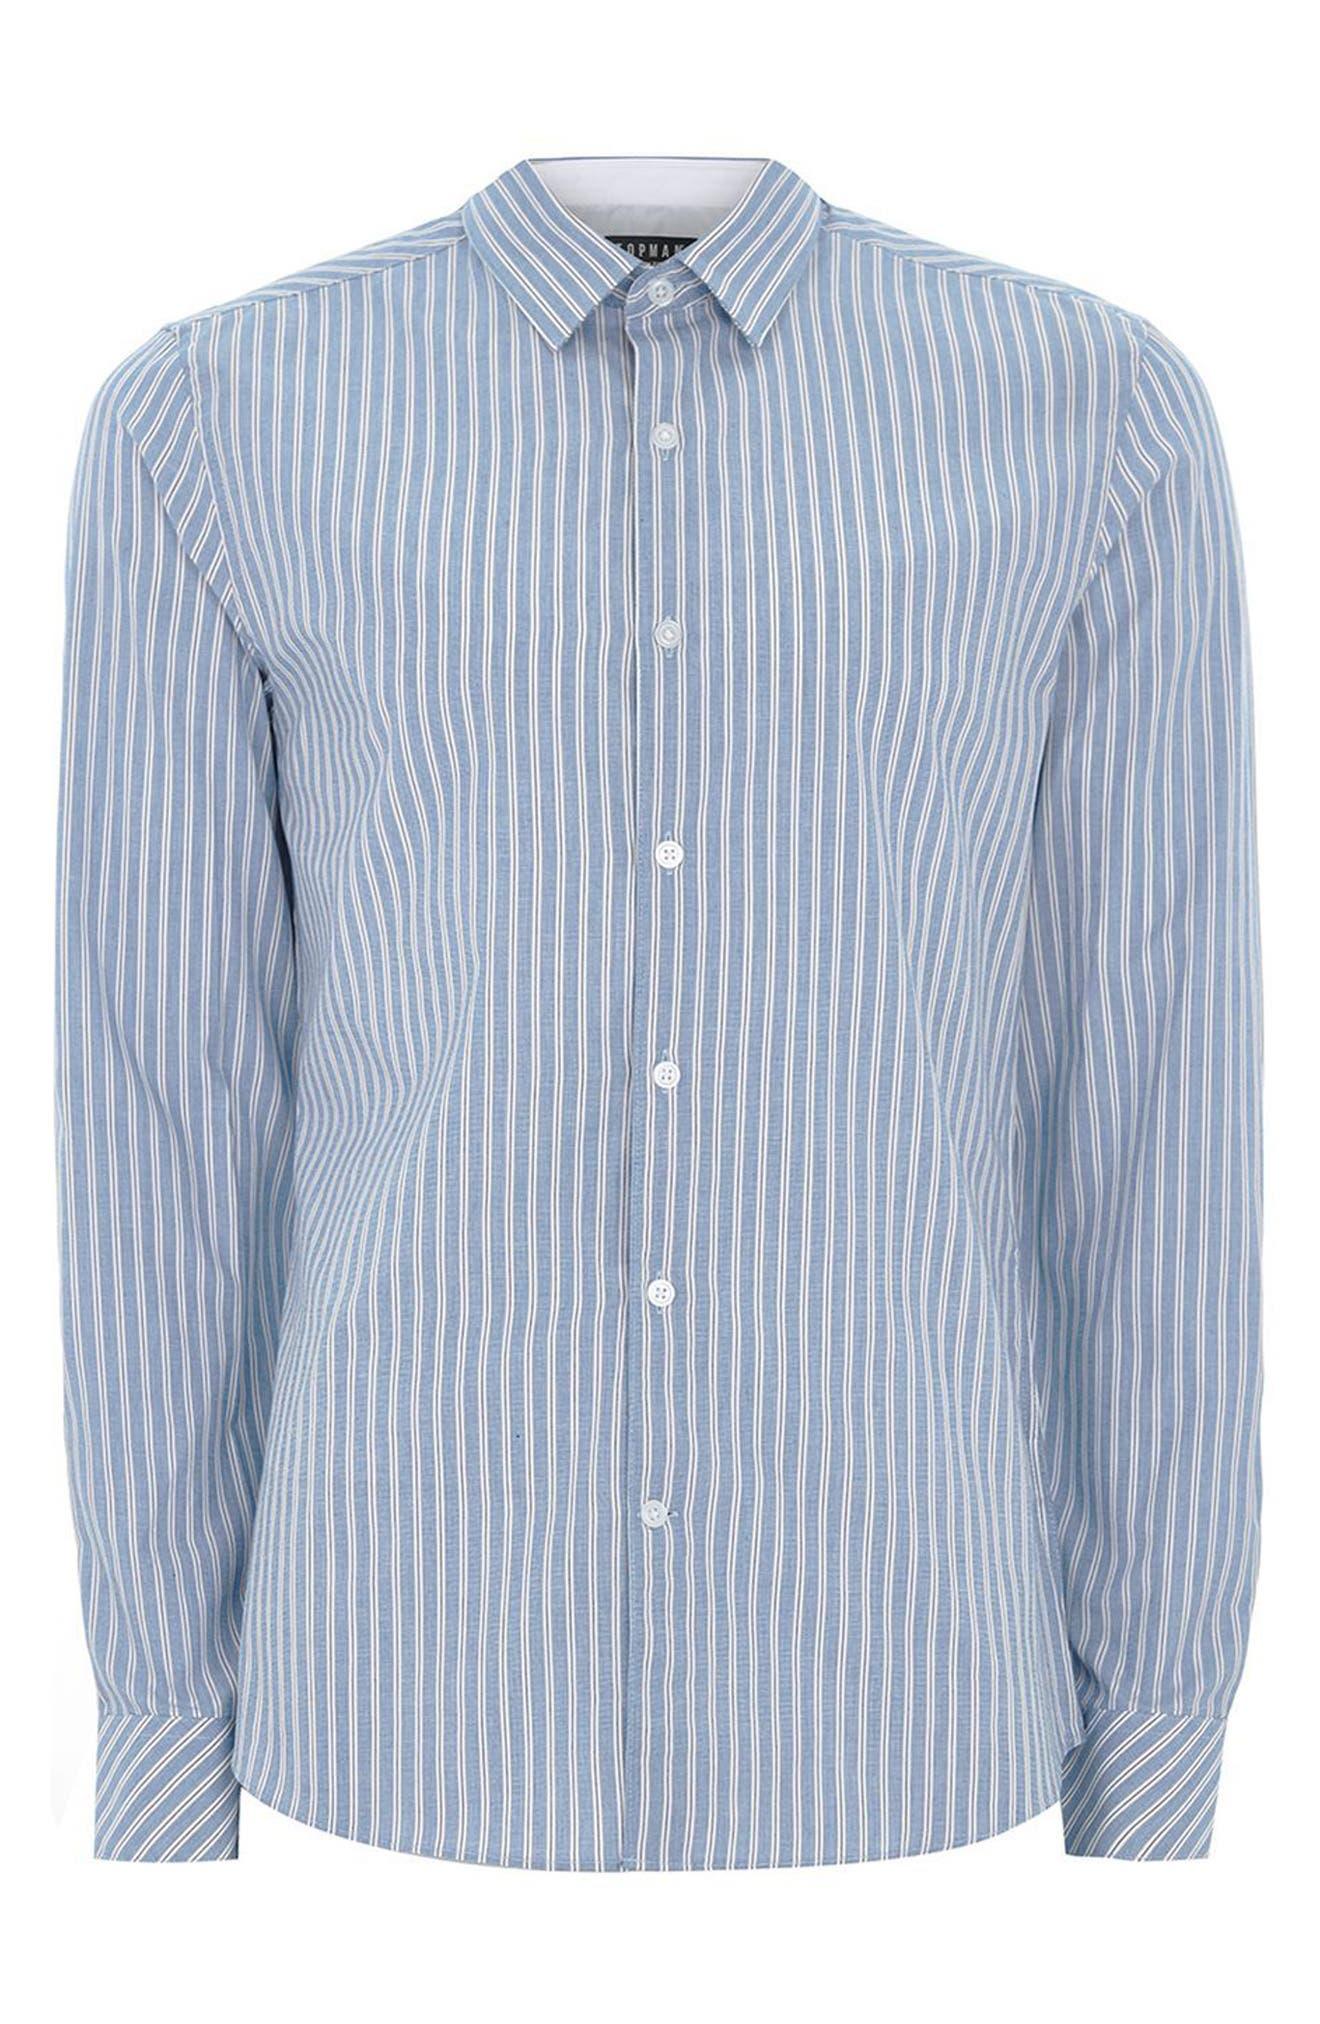 Classic Fit Stripe Smart Shirt,                             Alternate thumbnail 4, color,                             BLUE MULTI